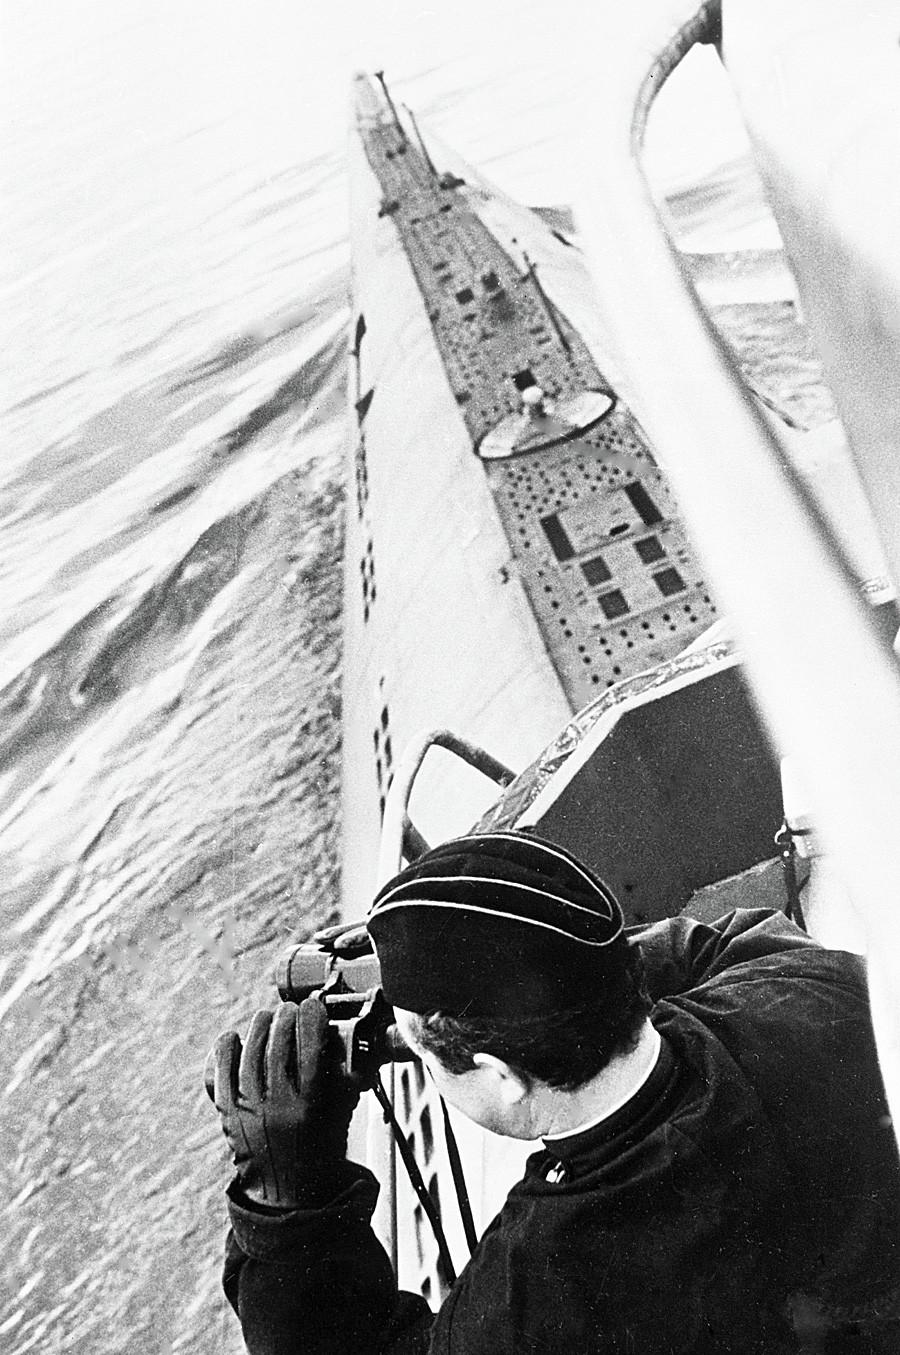 Comandante de un submarino otea el horizonte, 1968.